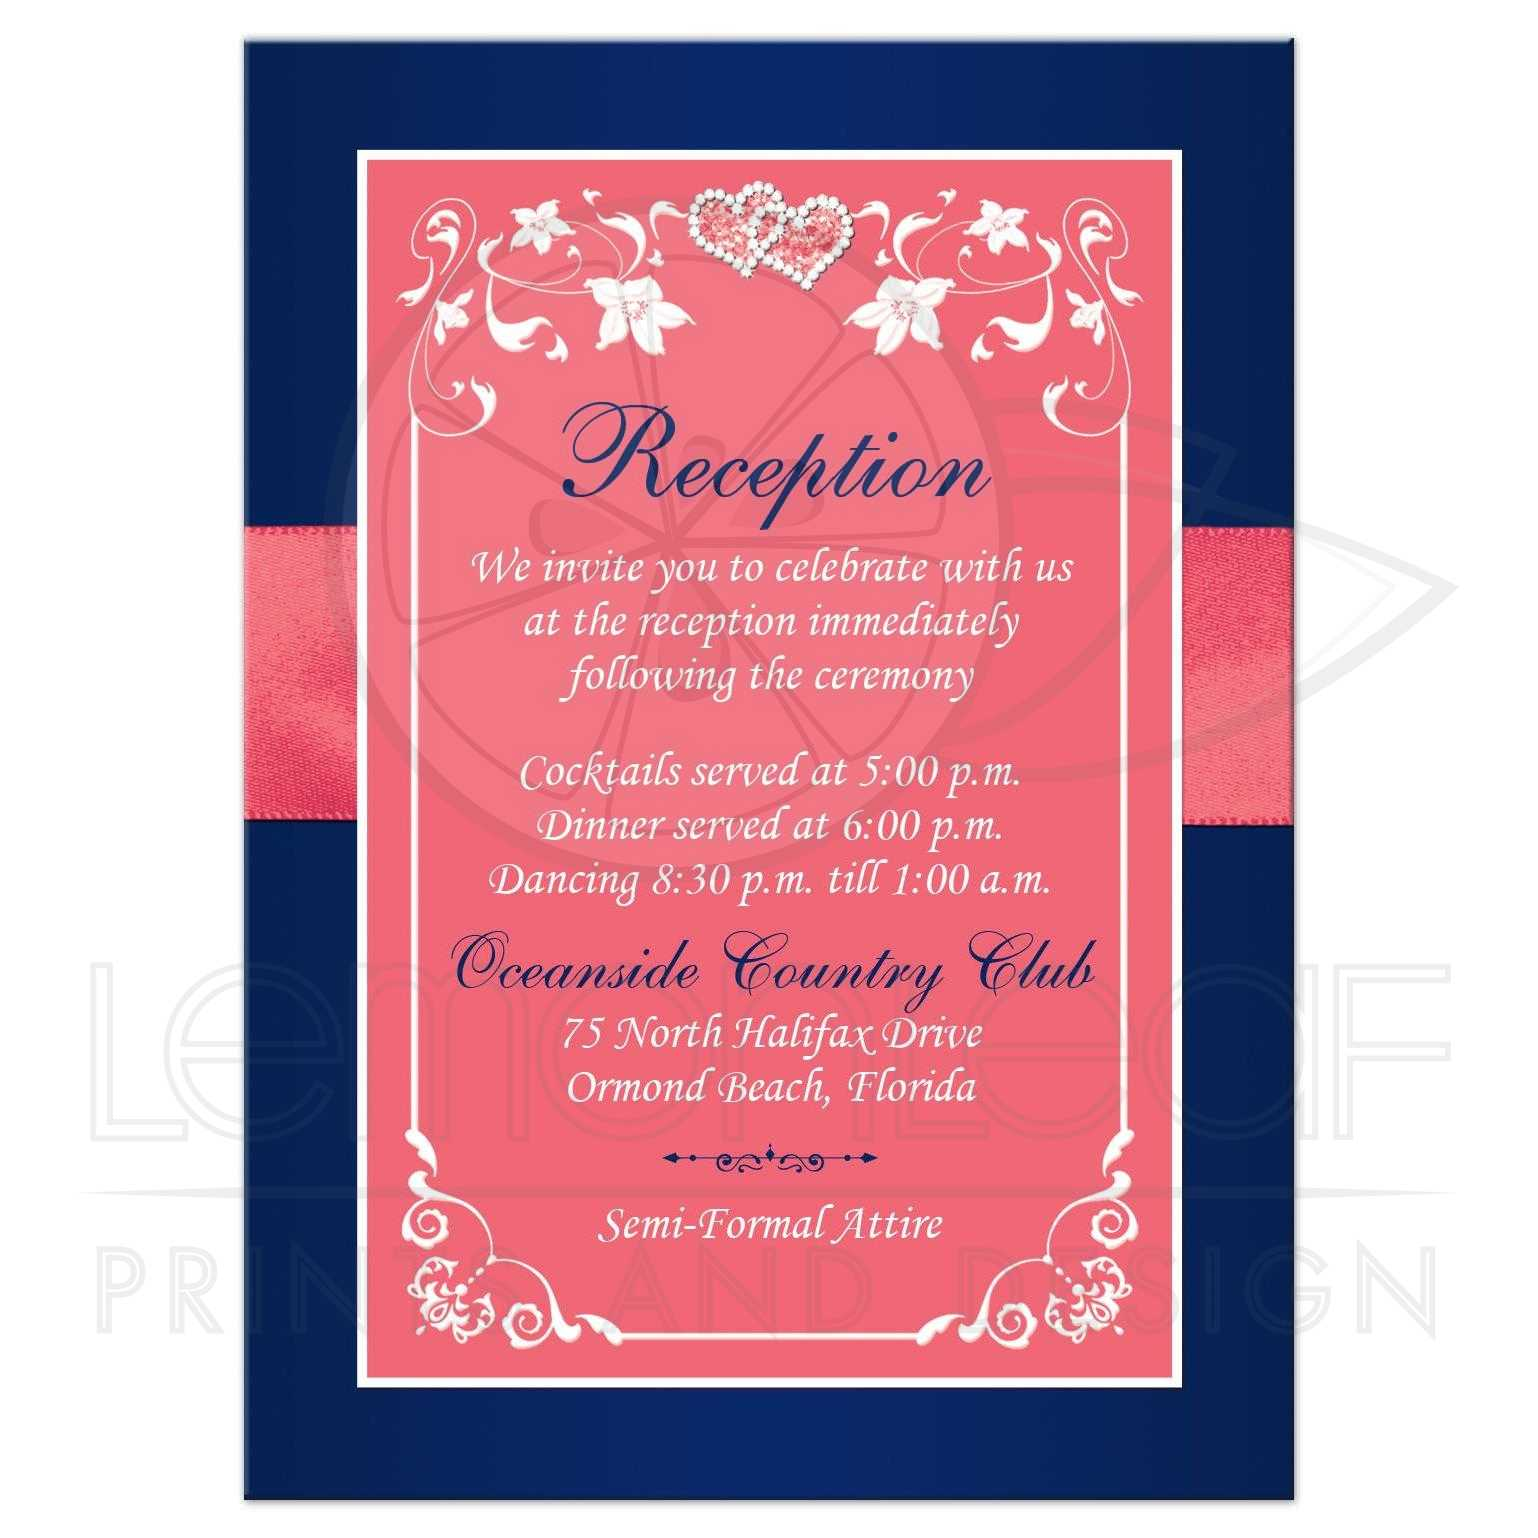 Wedding Reception Enclosure Card | Coral Pink, Navy Blue Printed ...